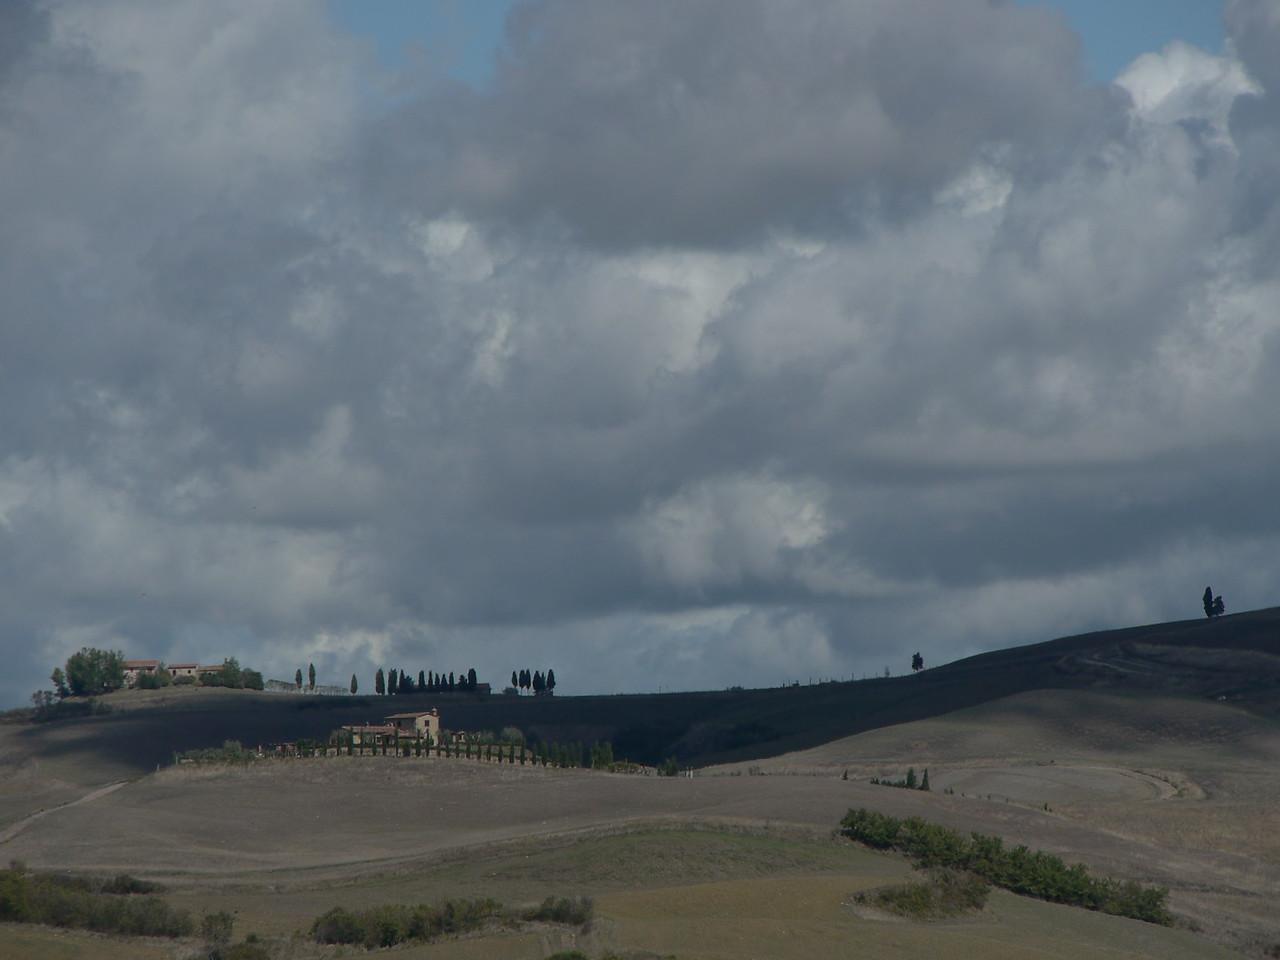 @RobAng 19.09.17, 11:17: Saline, 144 m, Saline, Toscana, Italien (ITA)